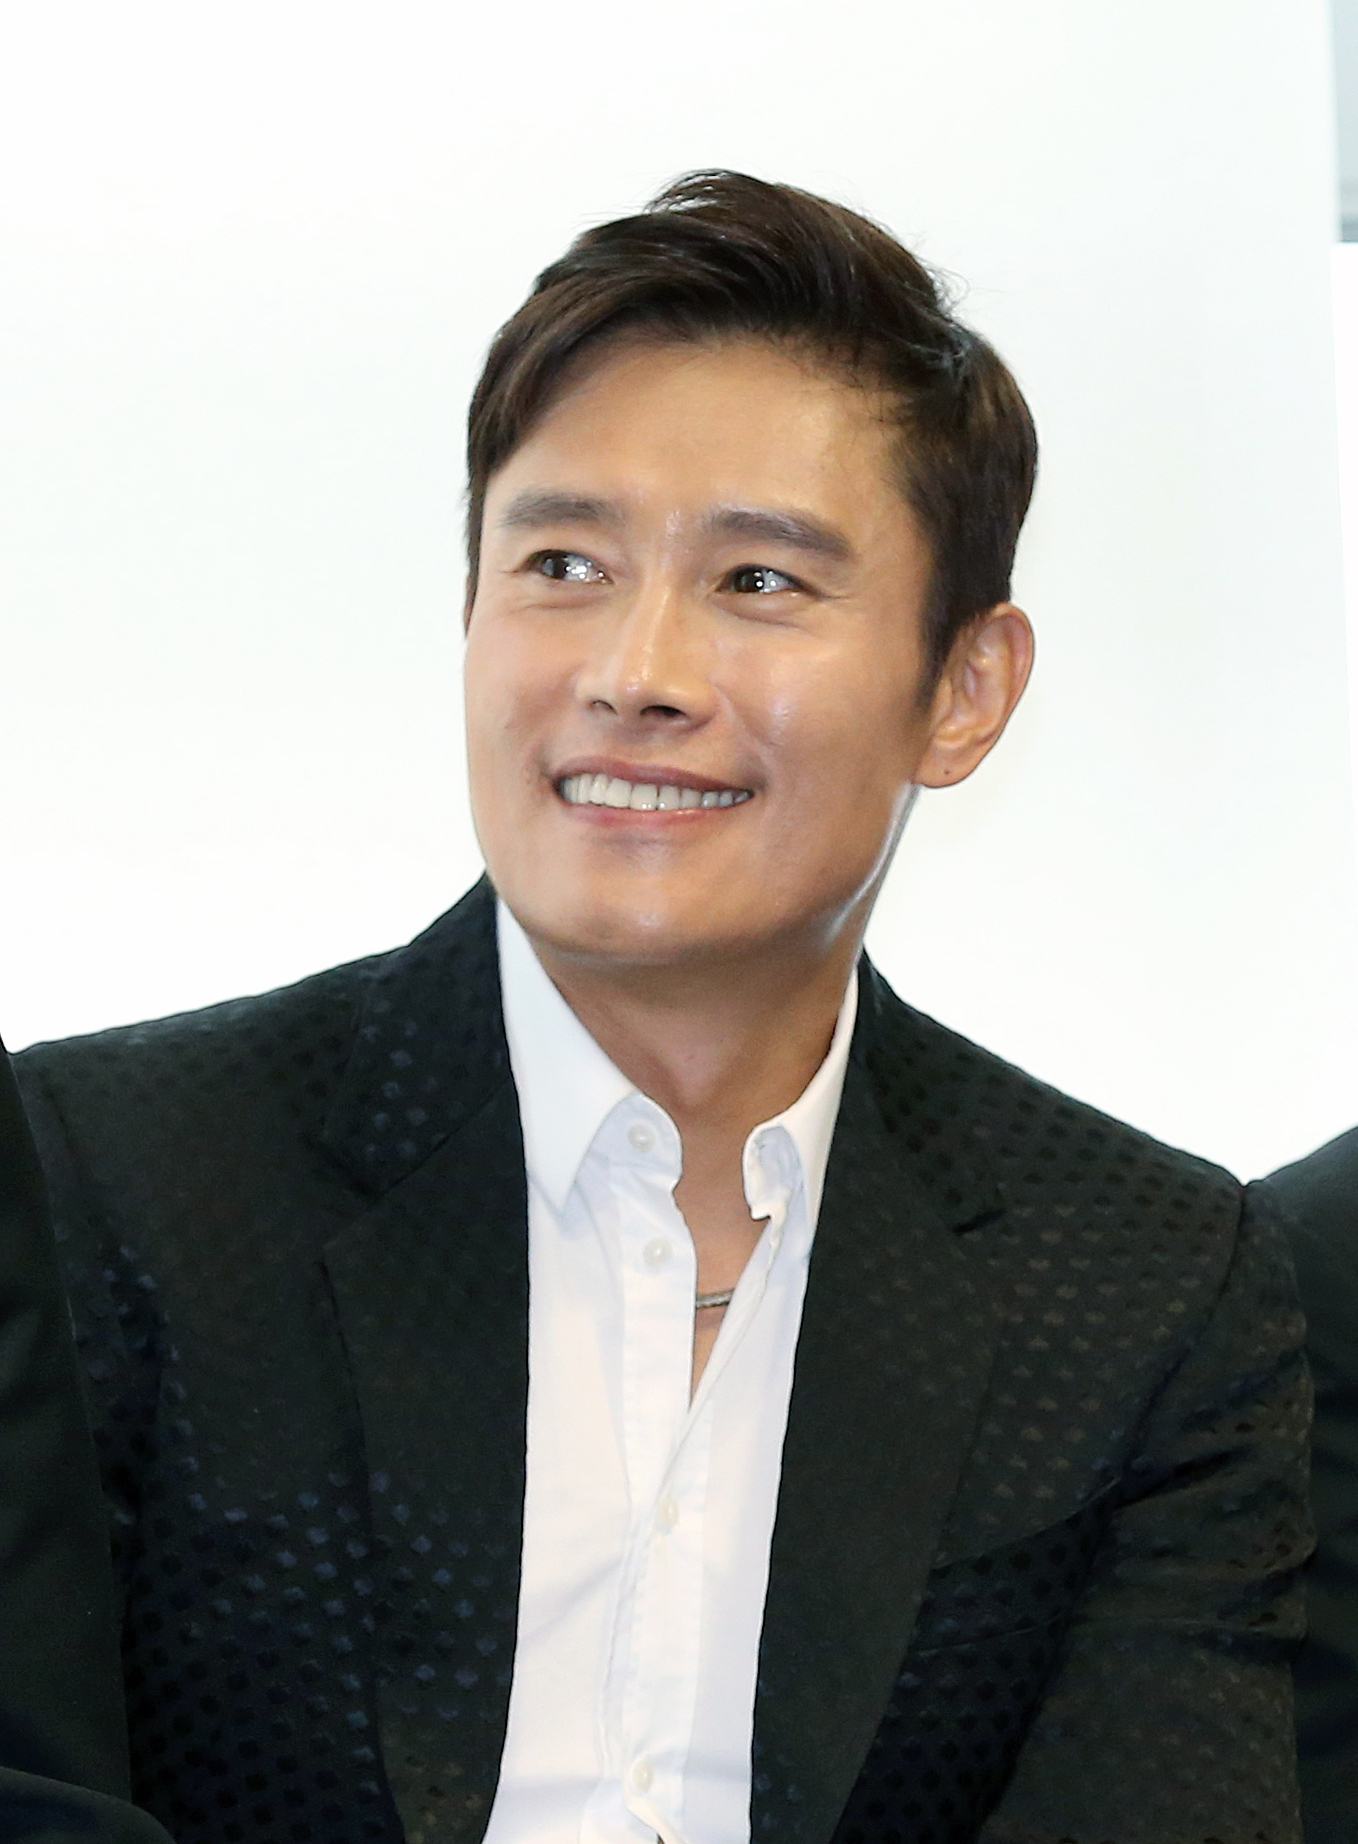 Byunghun